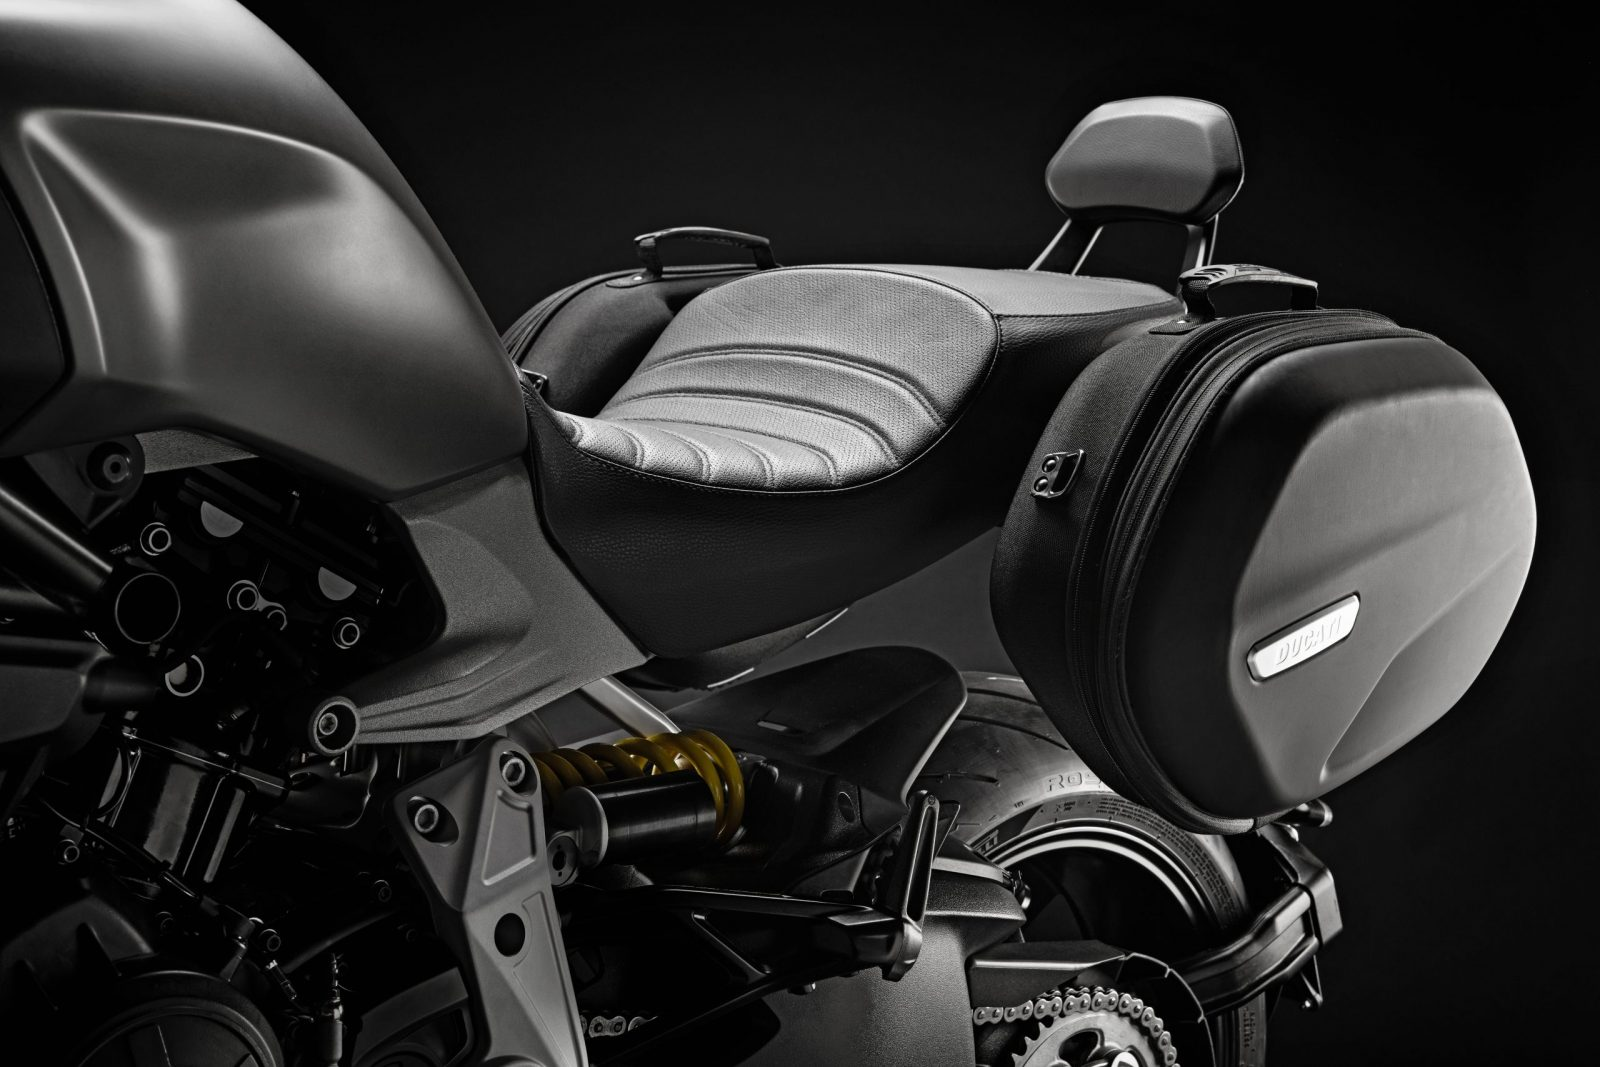 Ducati diavel oparcie